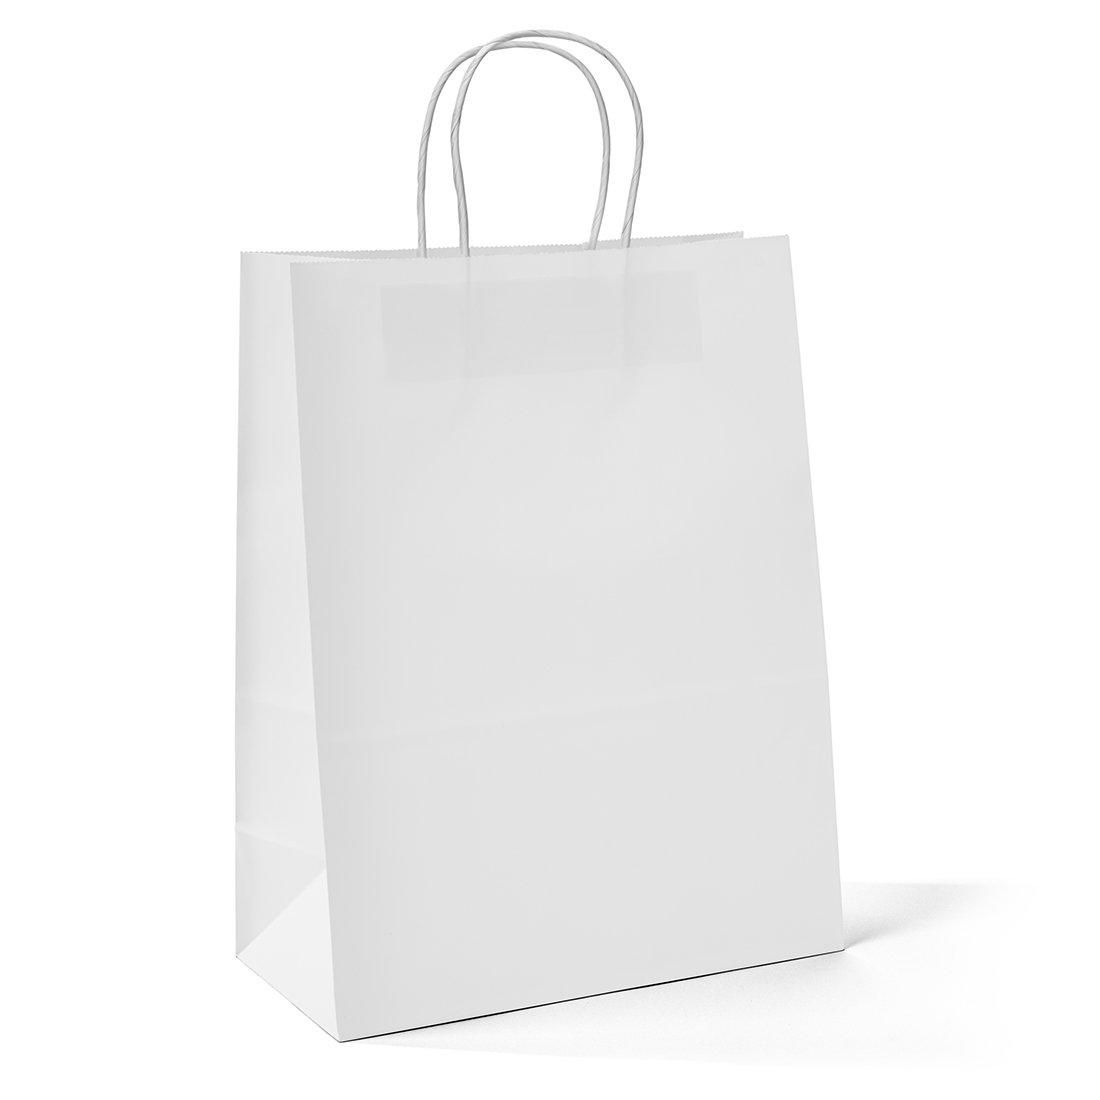 Halulu 100pcs 10''x5''x13'' - White Kraft Paper Bags, Shopping, Mechandise, Party, Gift Bags